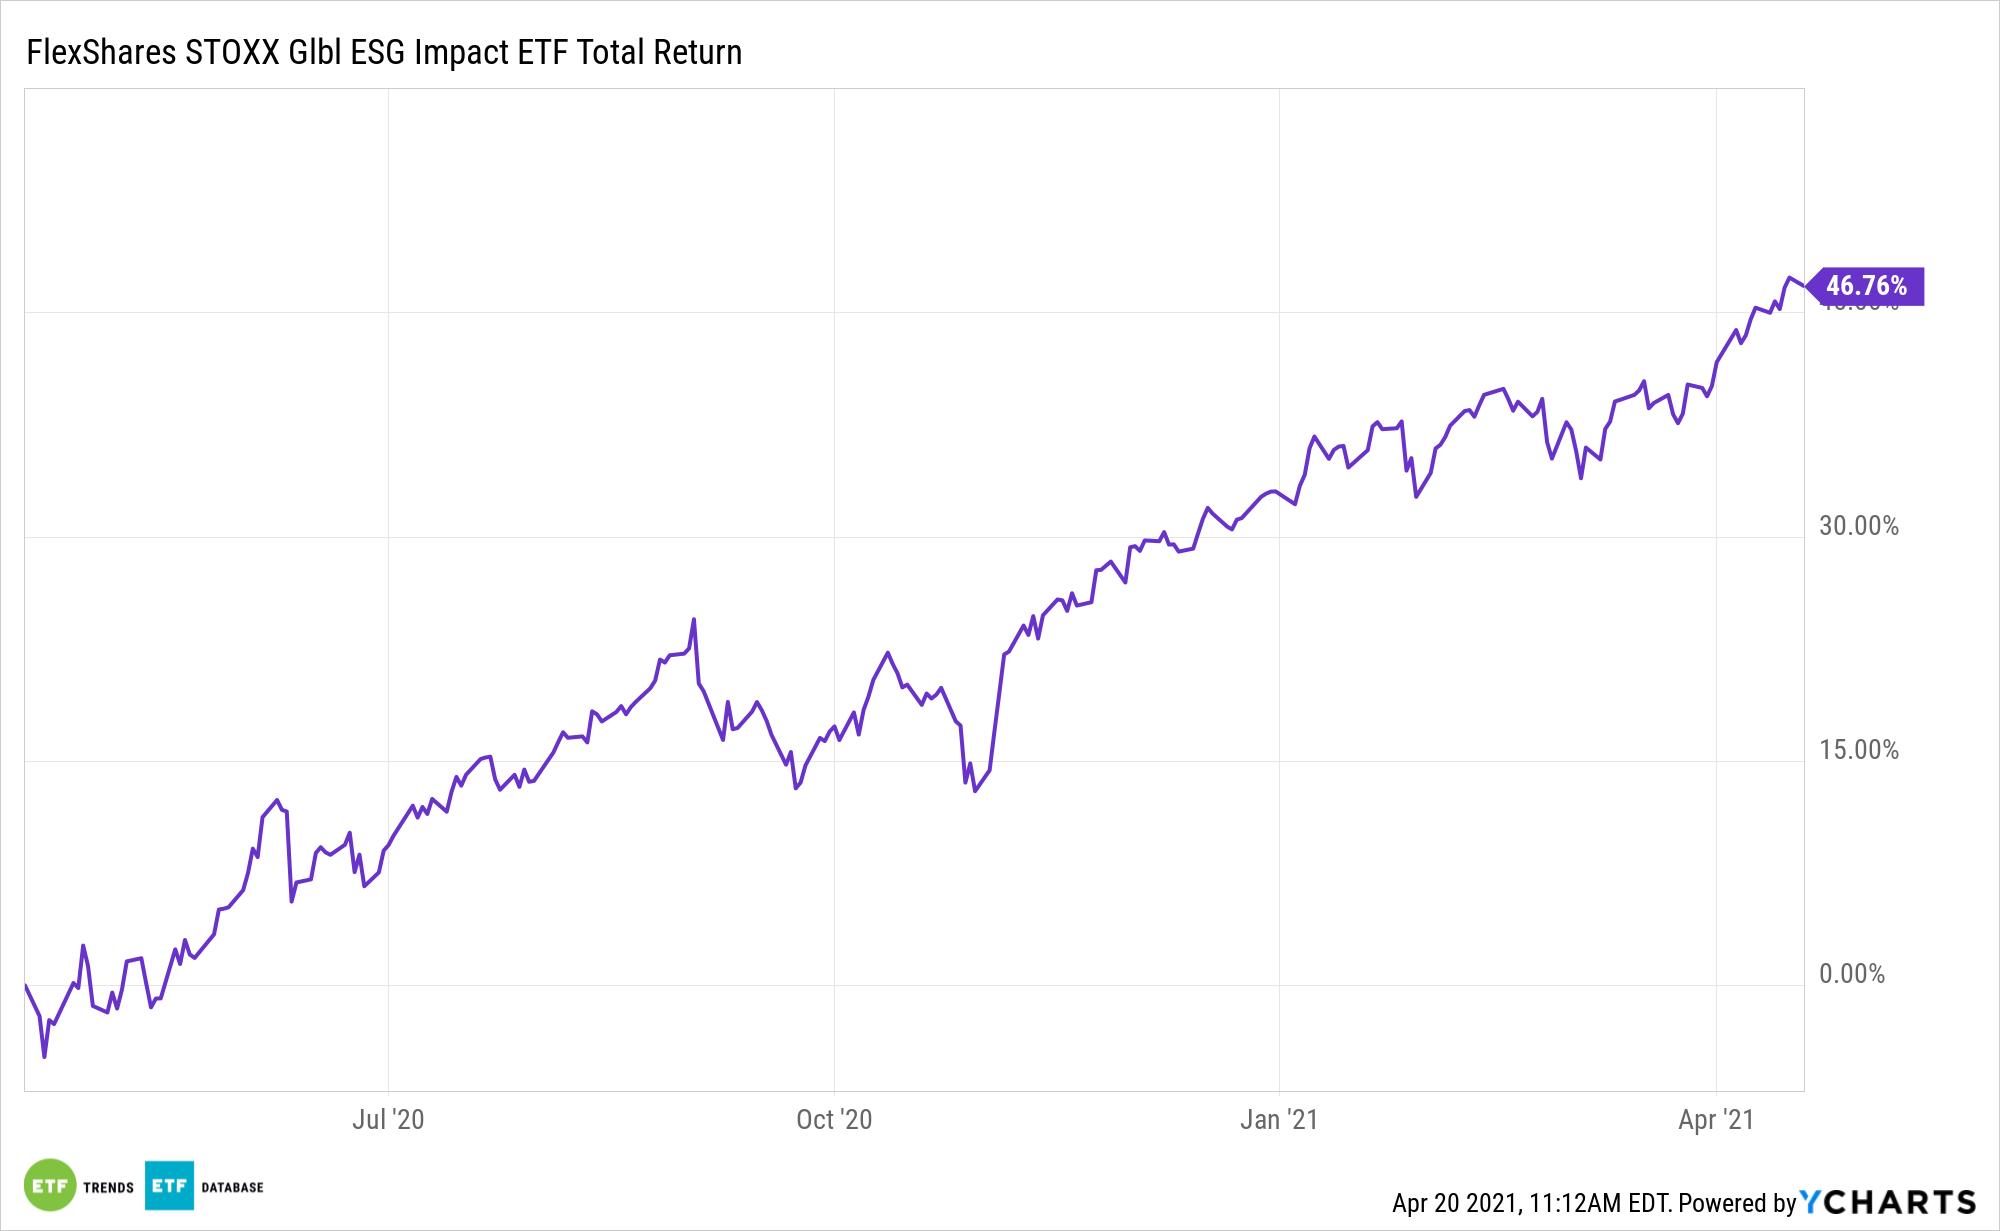 ESGG 1 Year Total Return